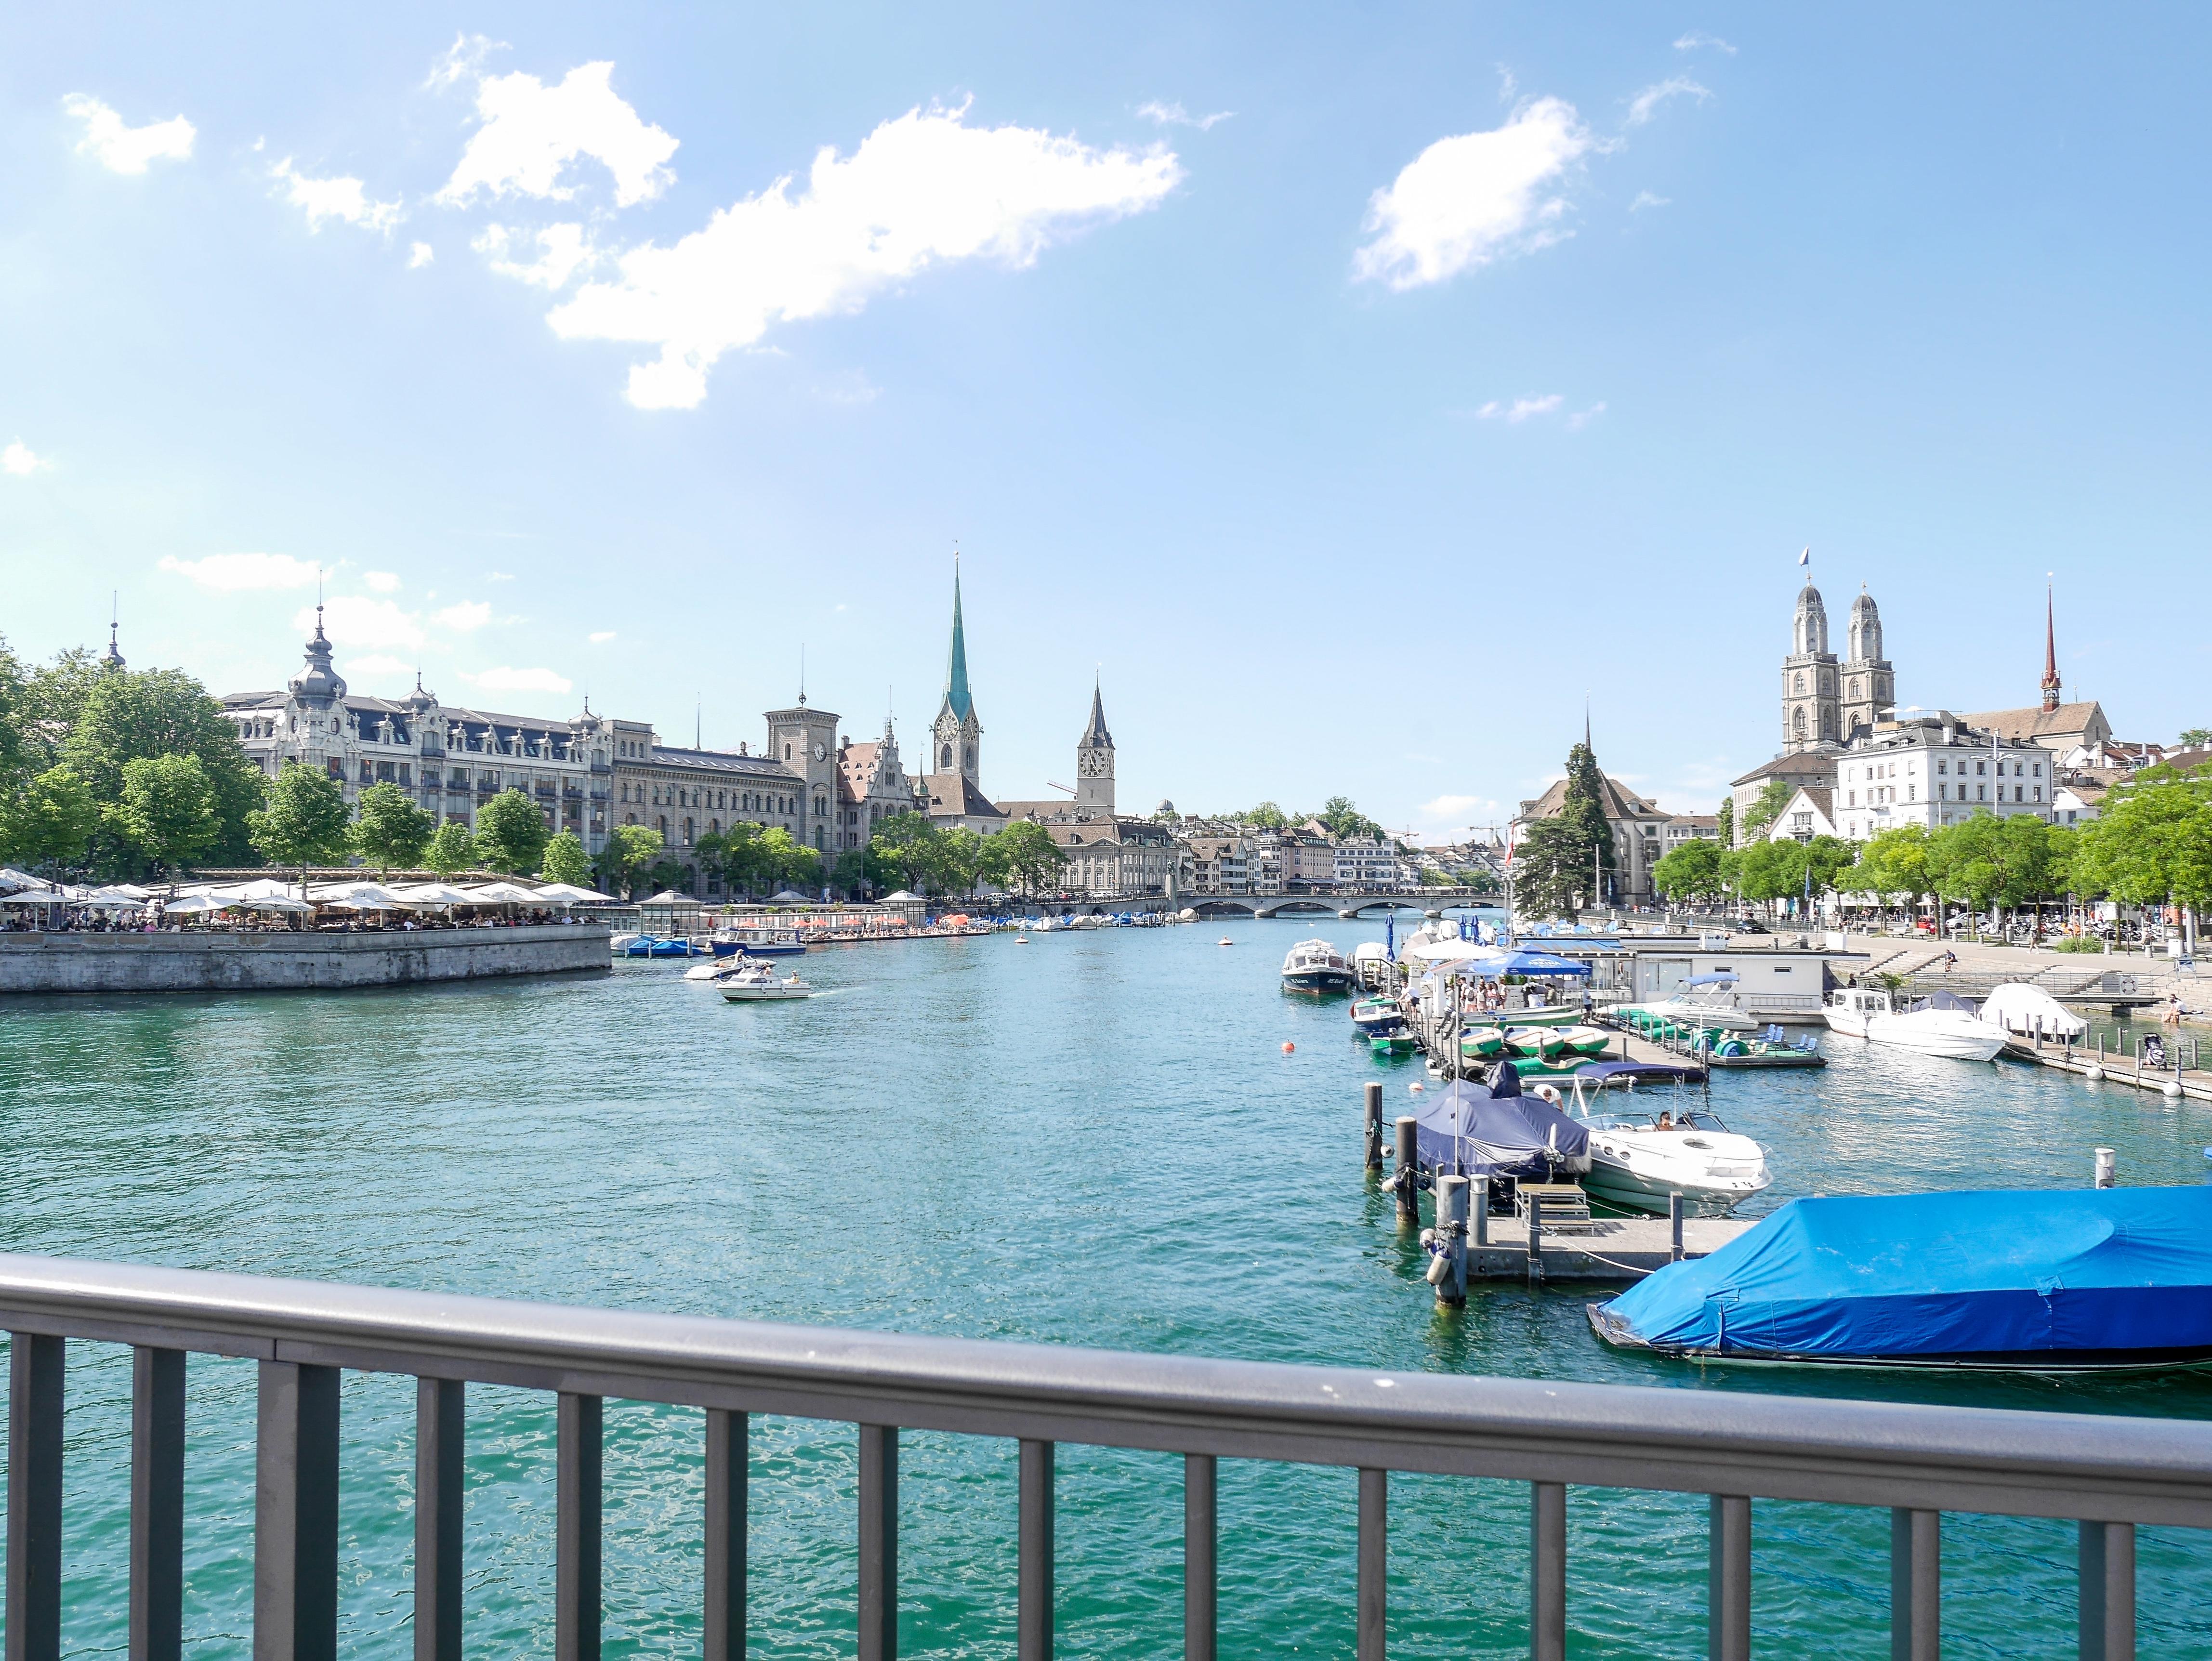 Zurich matkavinkkejä